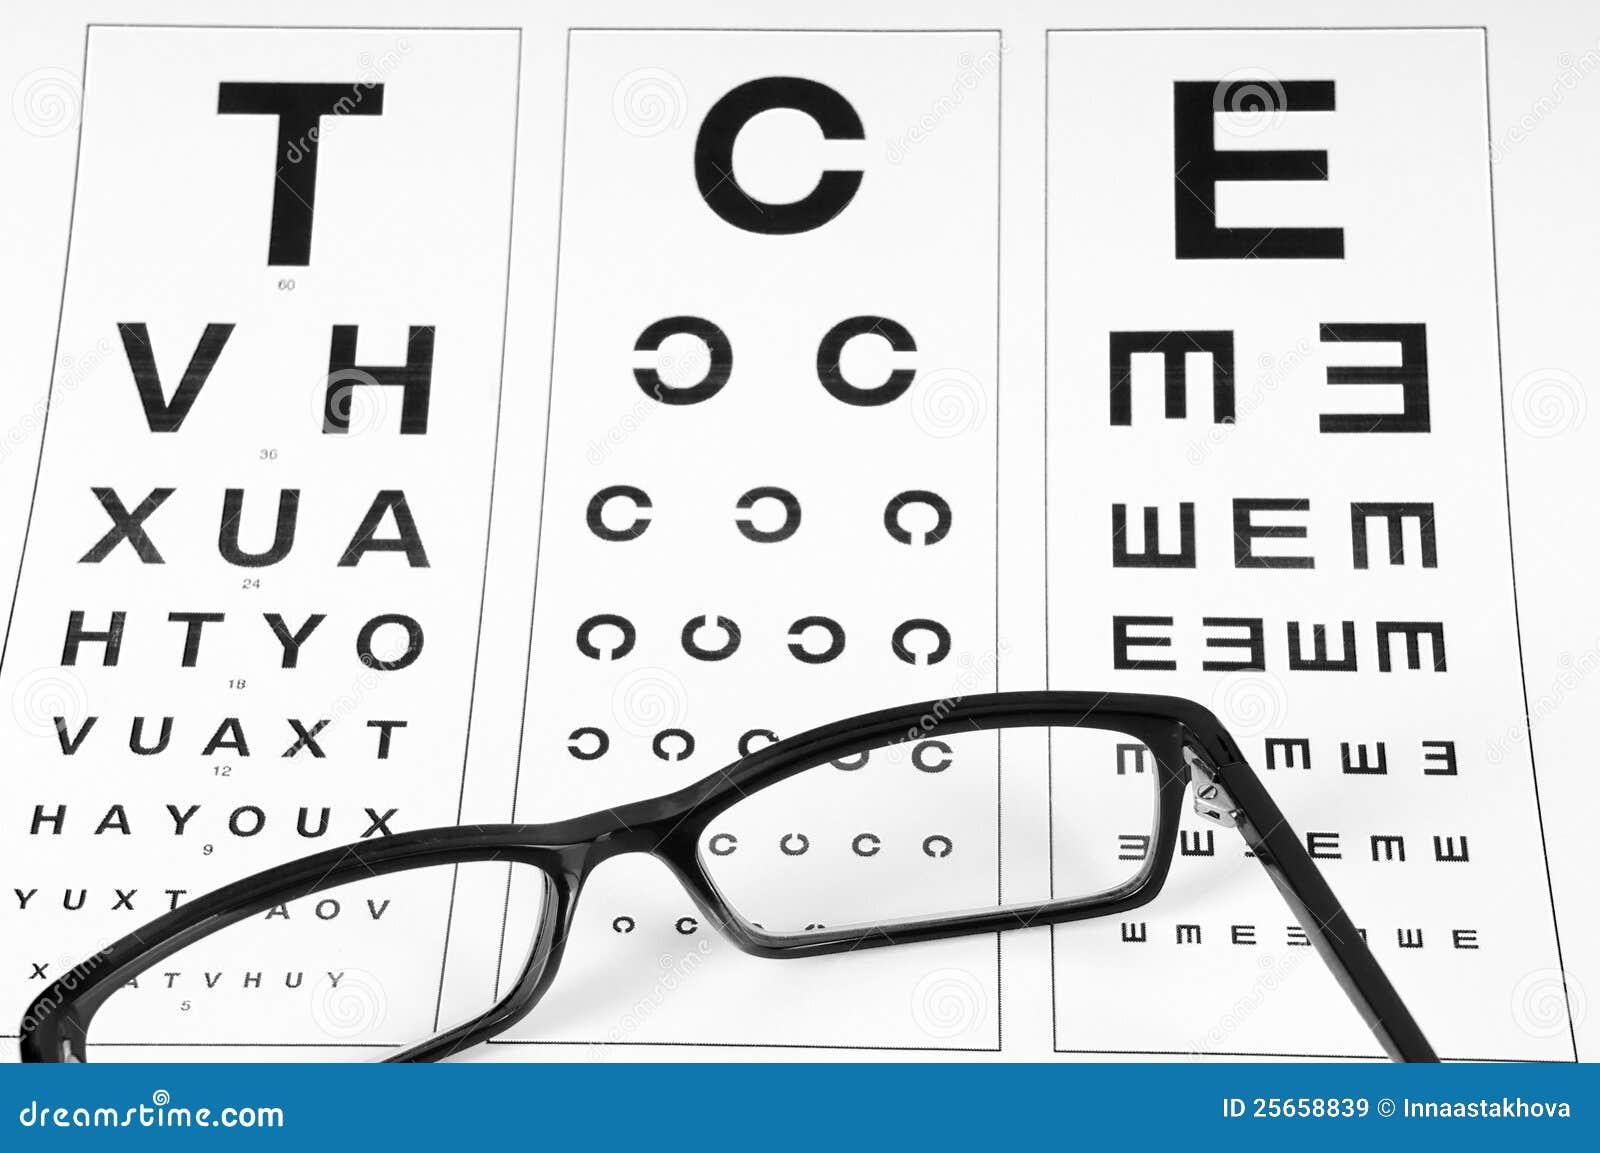 reading eyeglasses and eye chart royalty free stock images